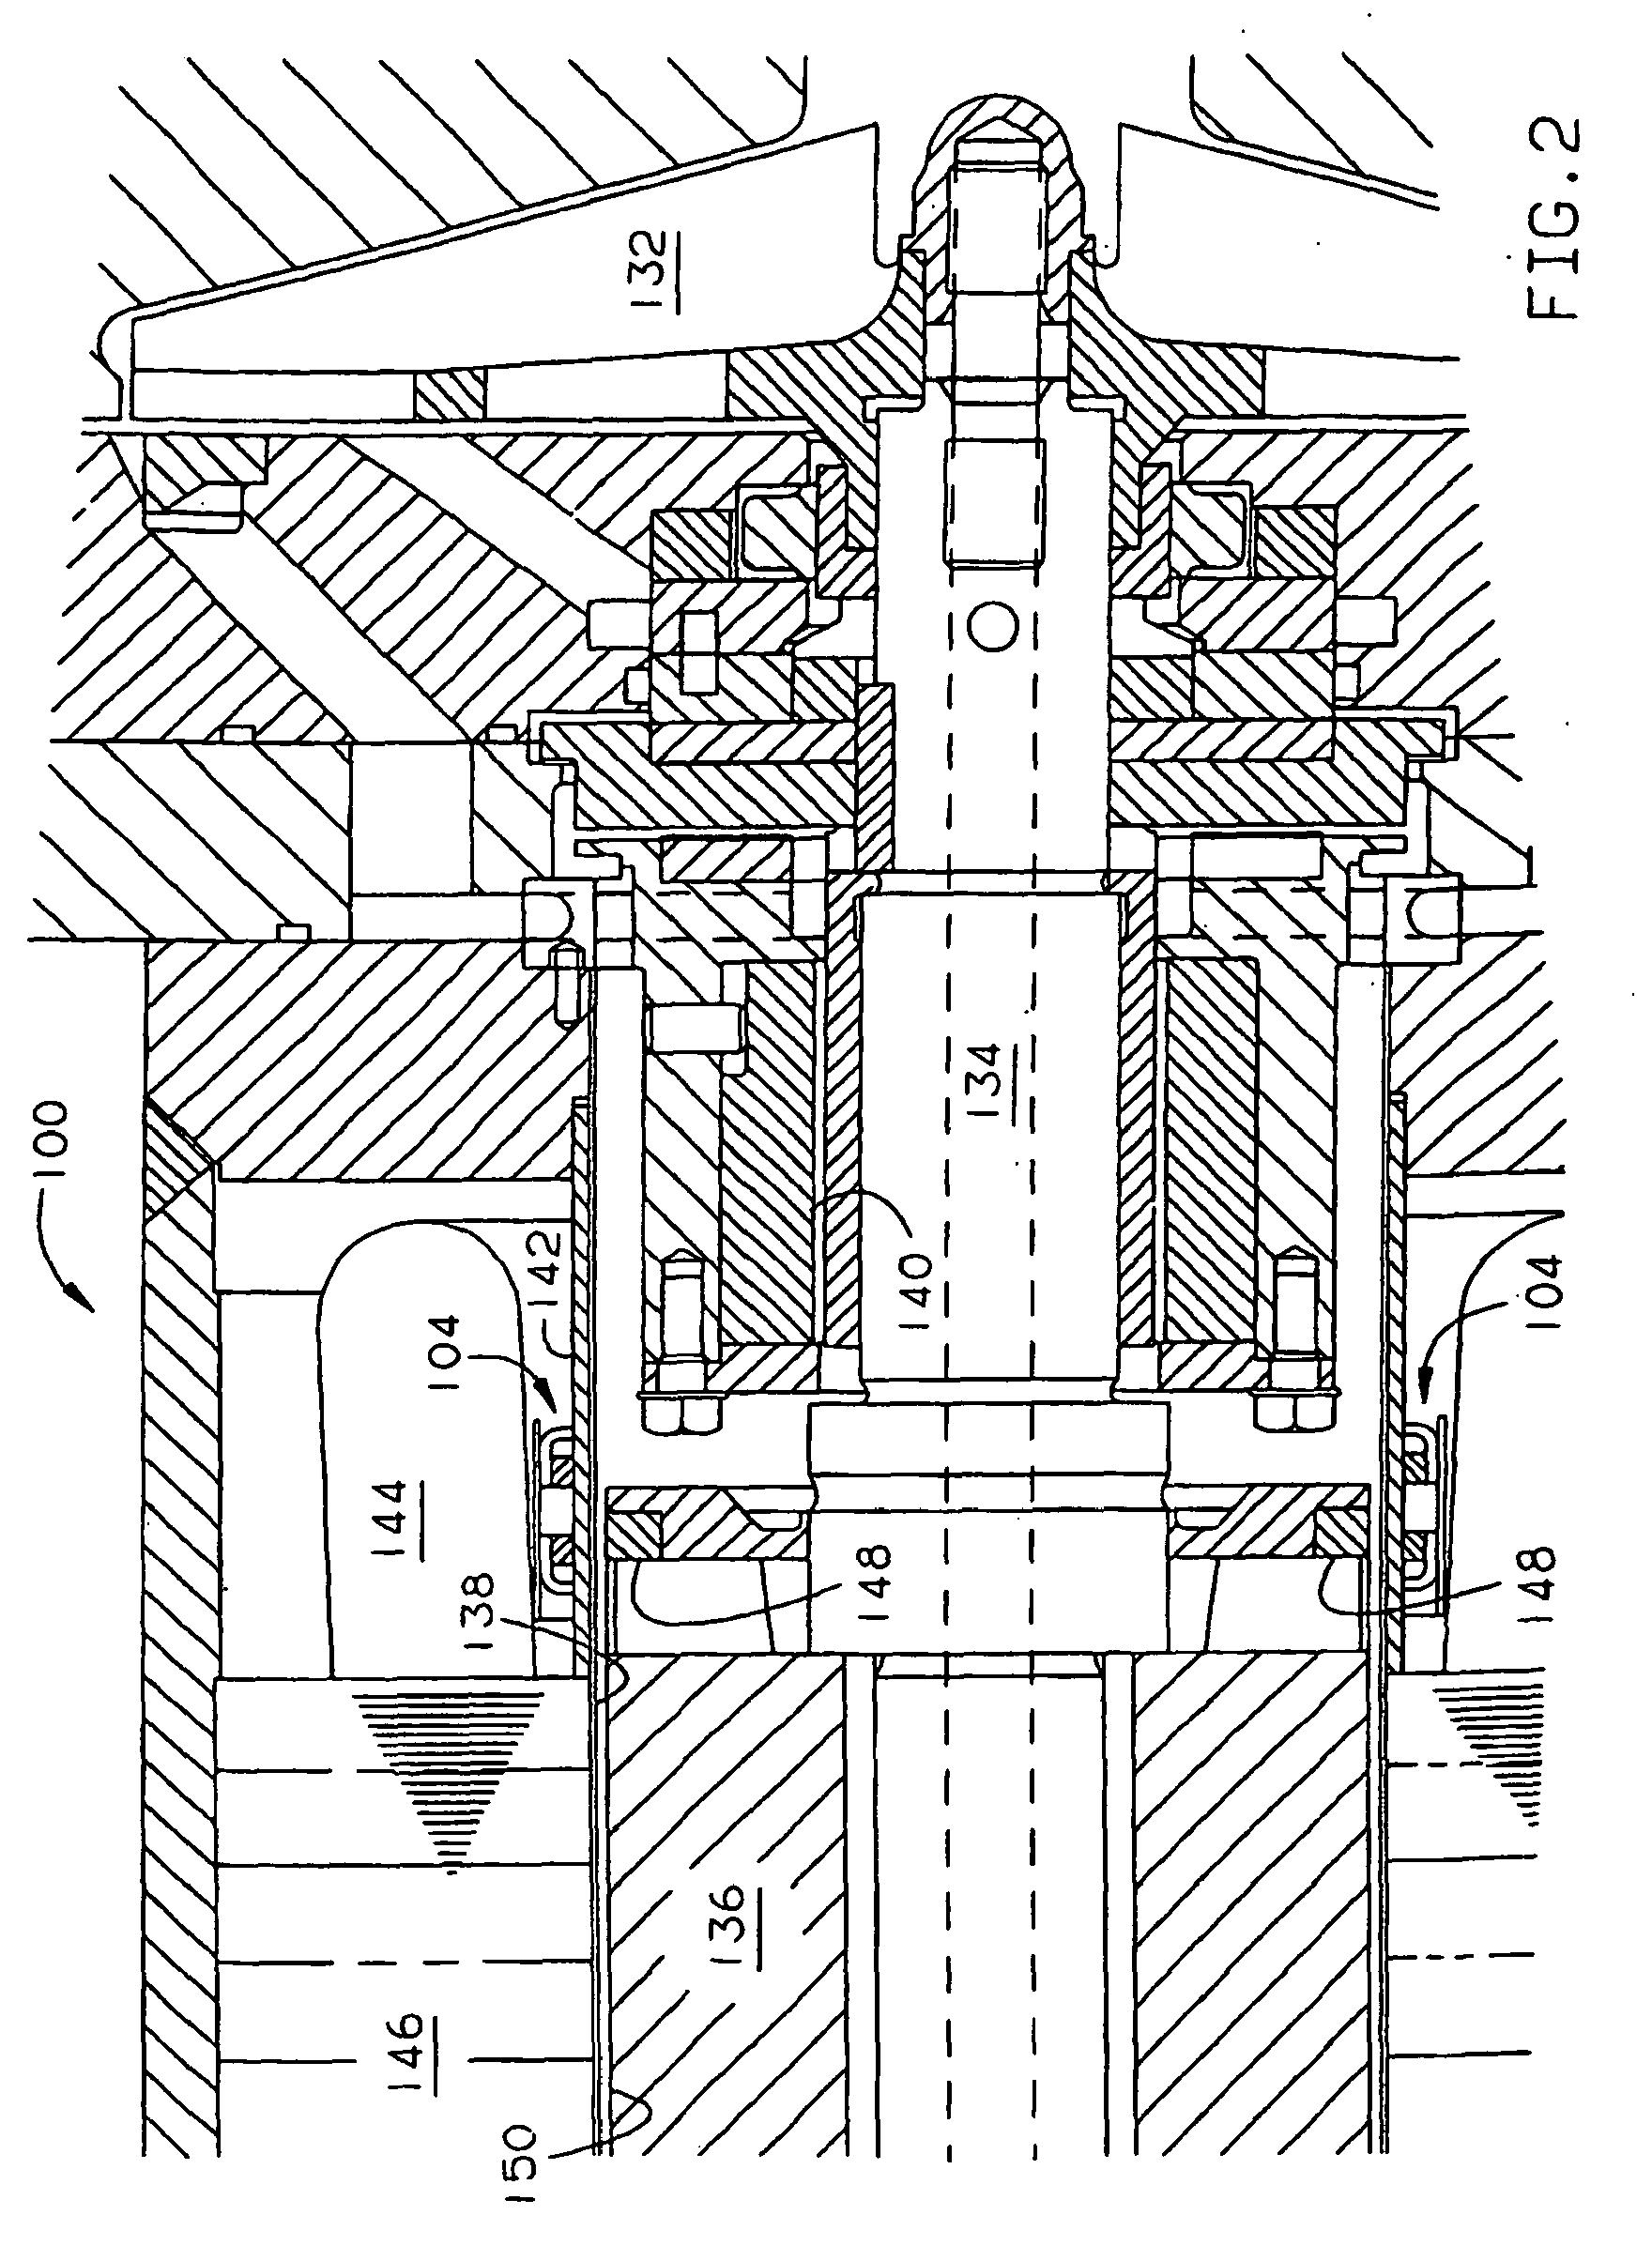 Lennox Heat Pump Wiring Diagram Thermostat - The Best Wiring Diagram ...